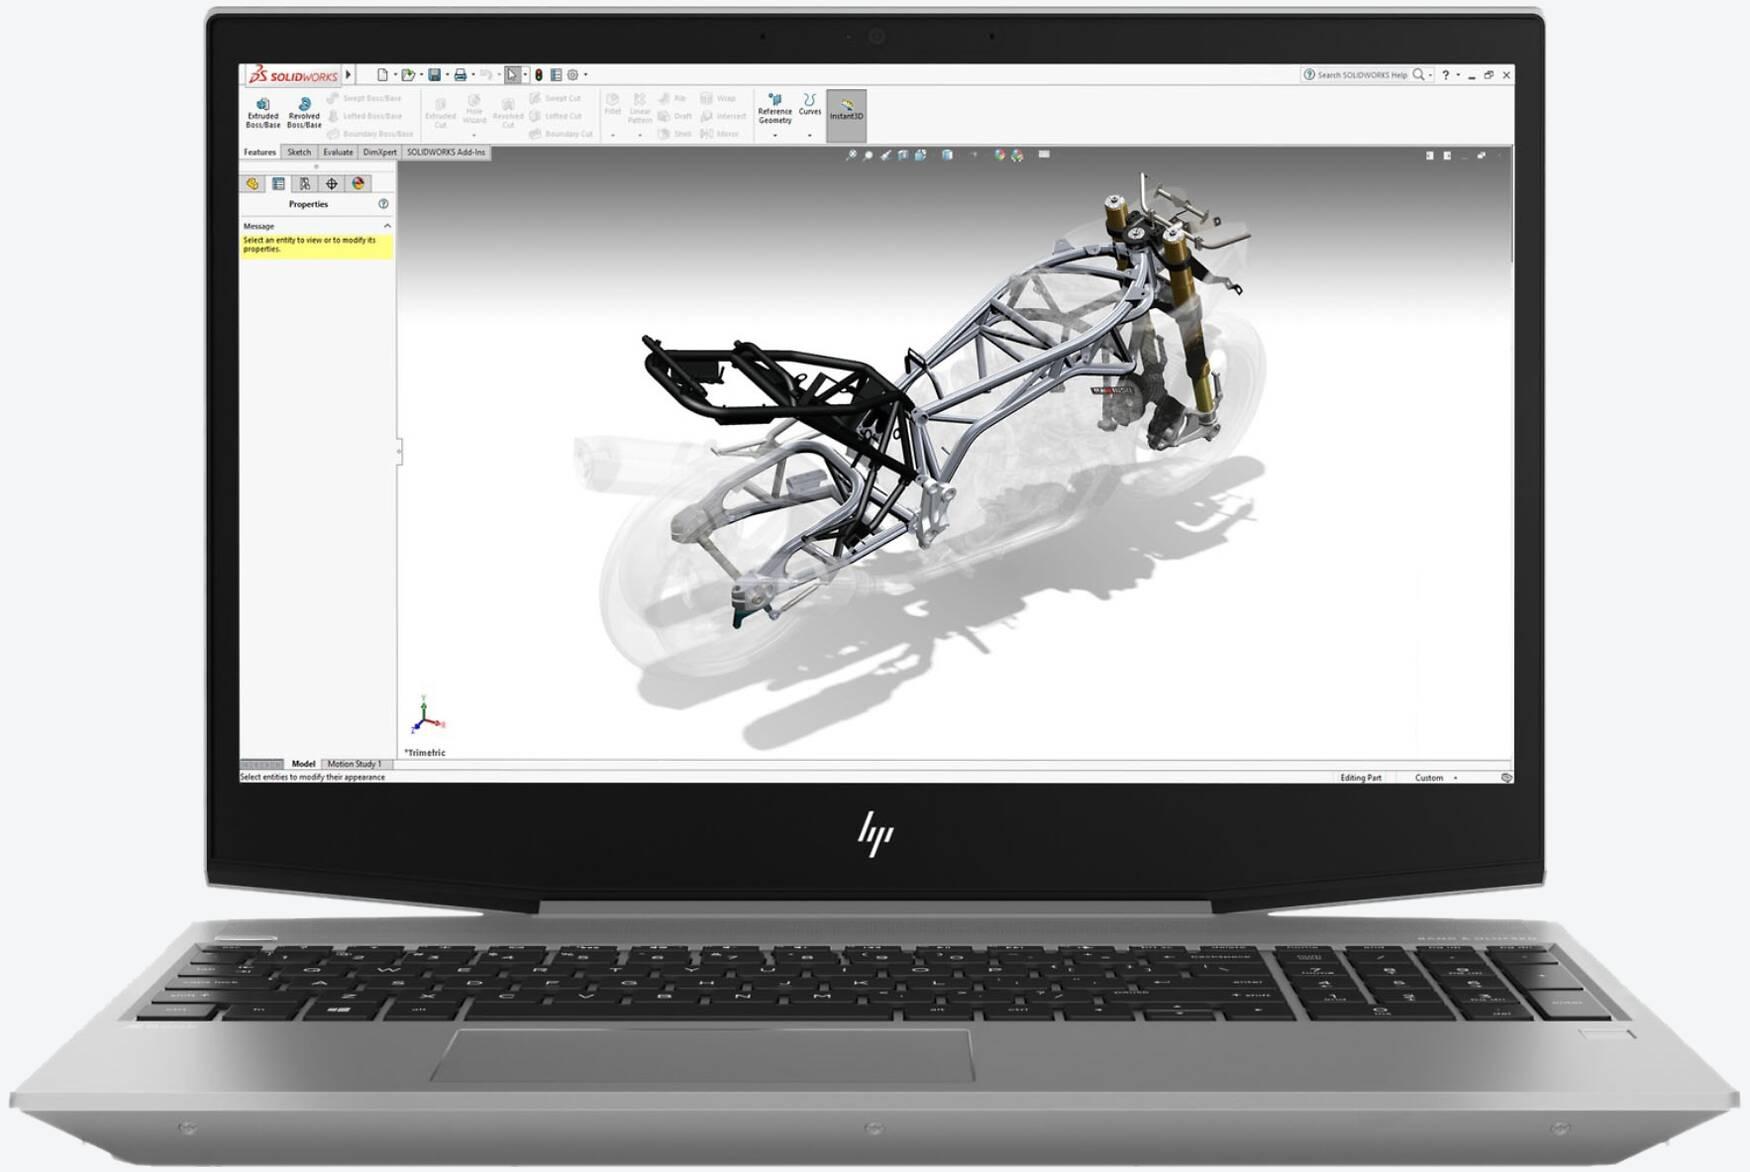 HP ZBook 15v G5 (4QH79EA)